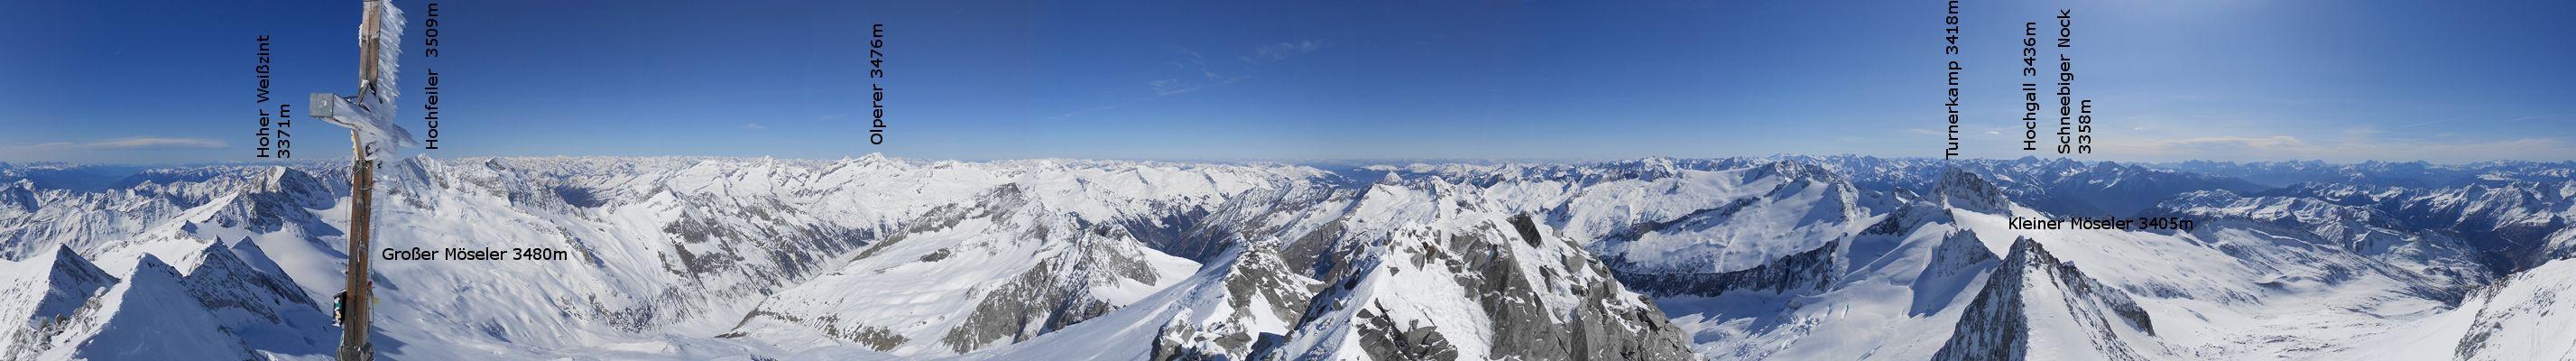 Panorama_GrosserMoeseler